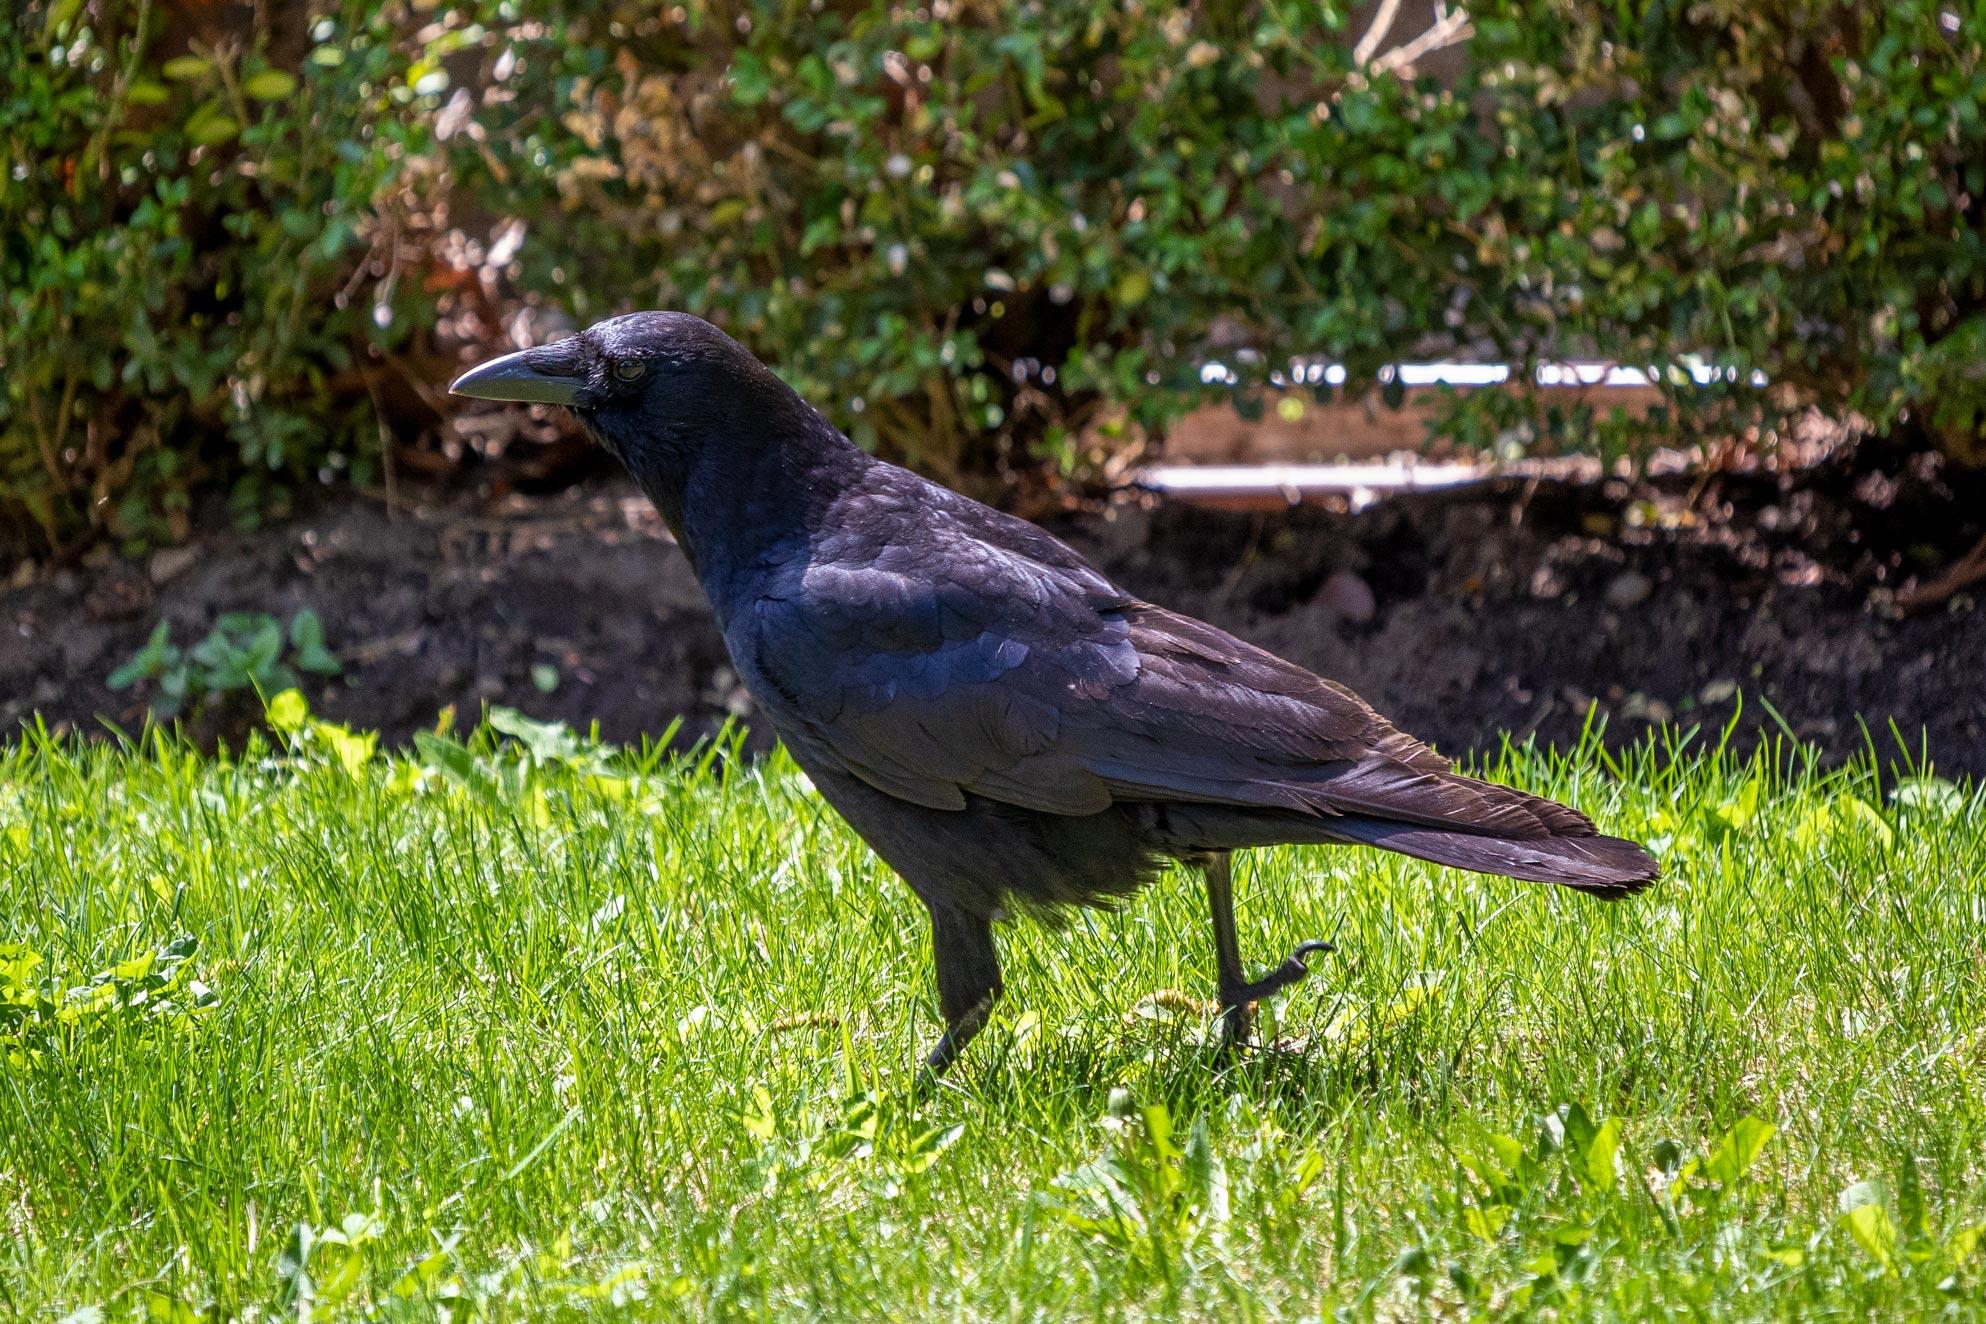 Black bird walking on the grass